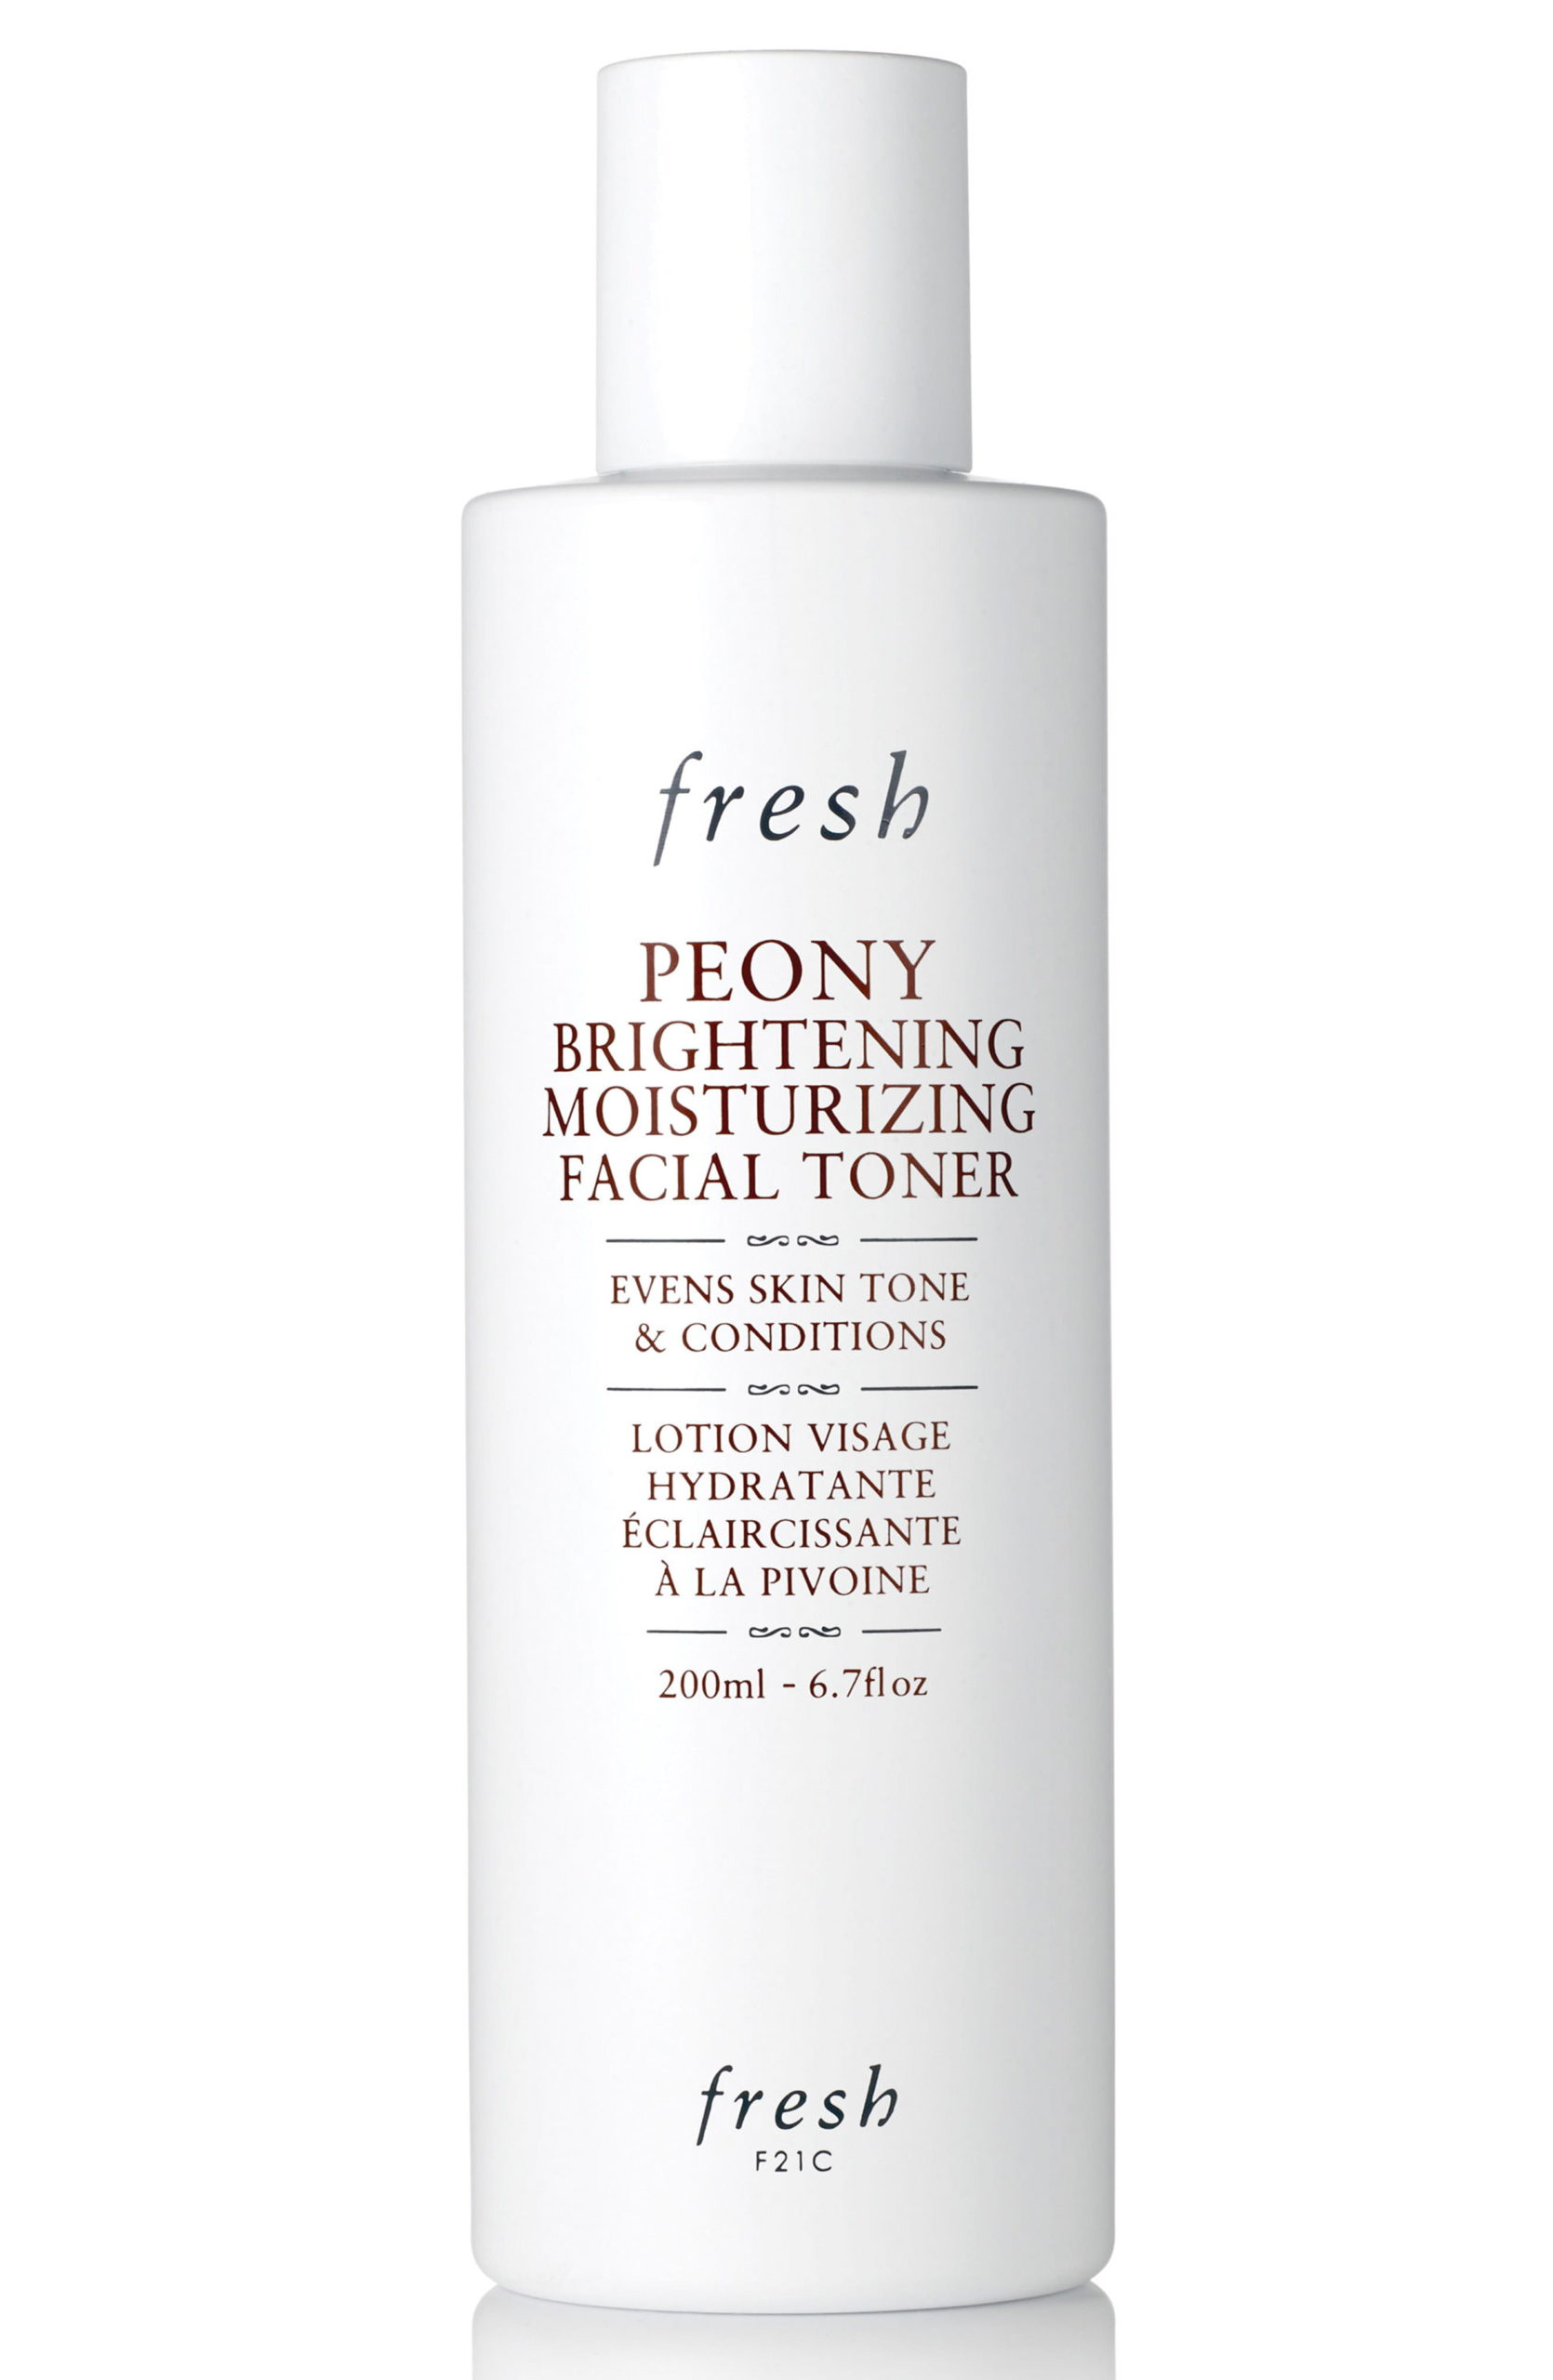 Peony Brightening Moisturizing Facial Toner